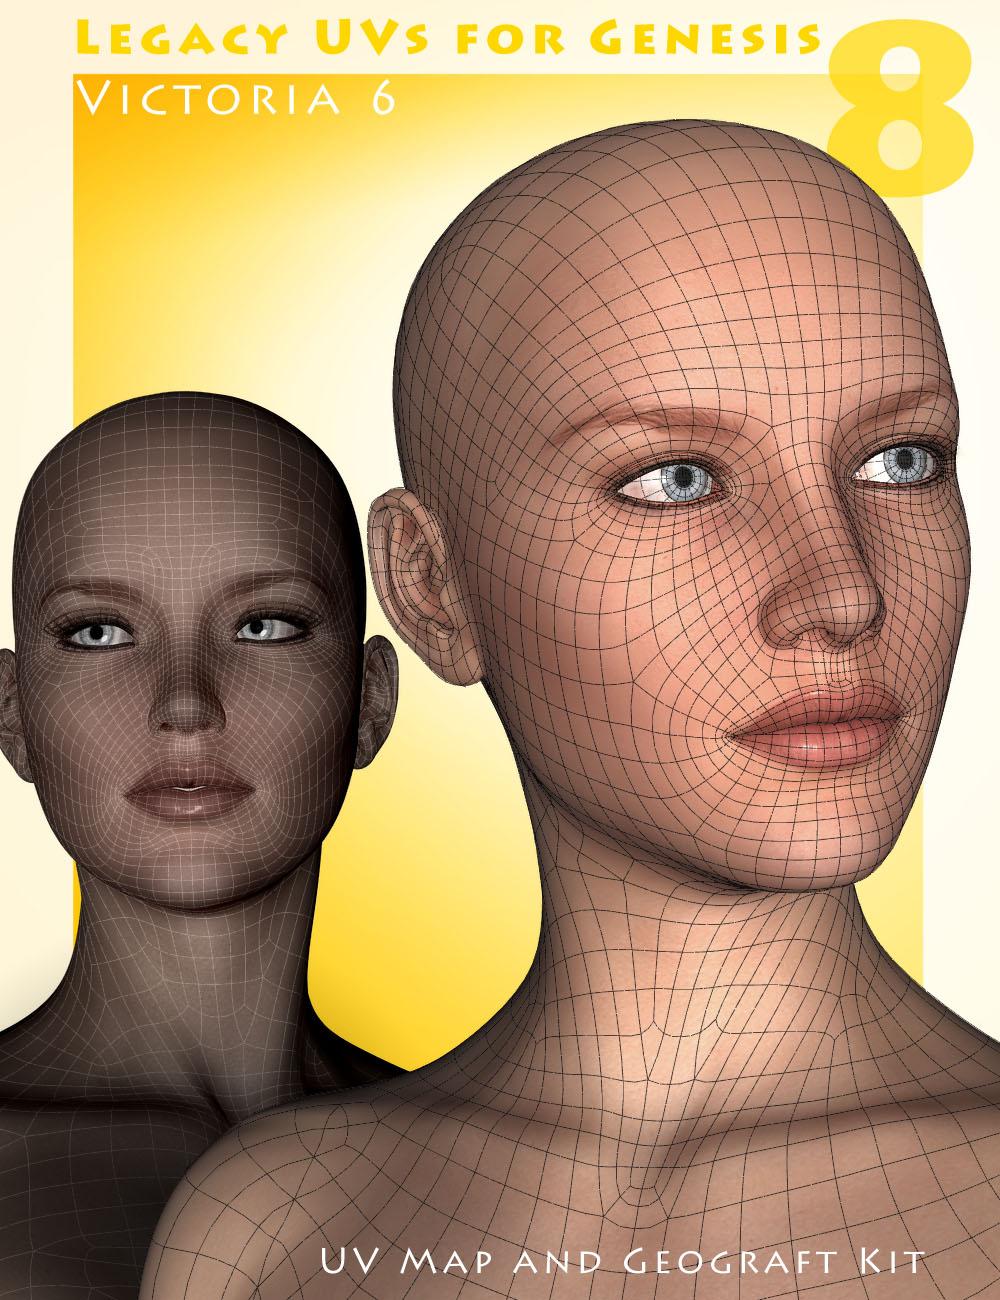 Legacy UVs for Genesis 8: Victoria 6 by: Cayman Studios, 3D Models by Daz 3D